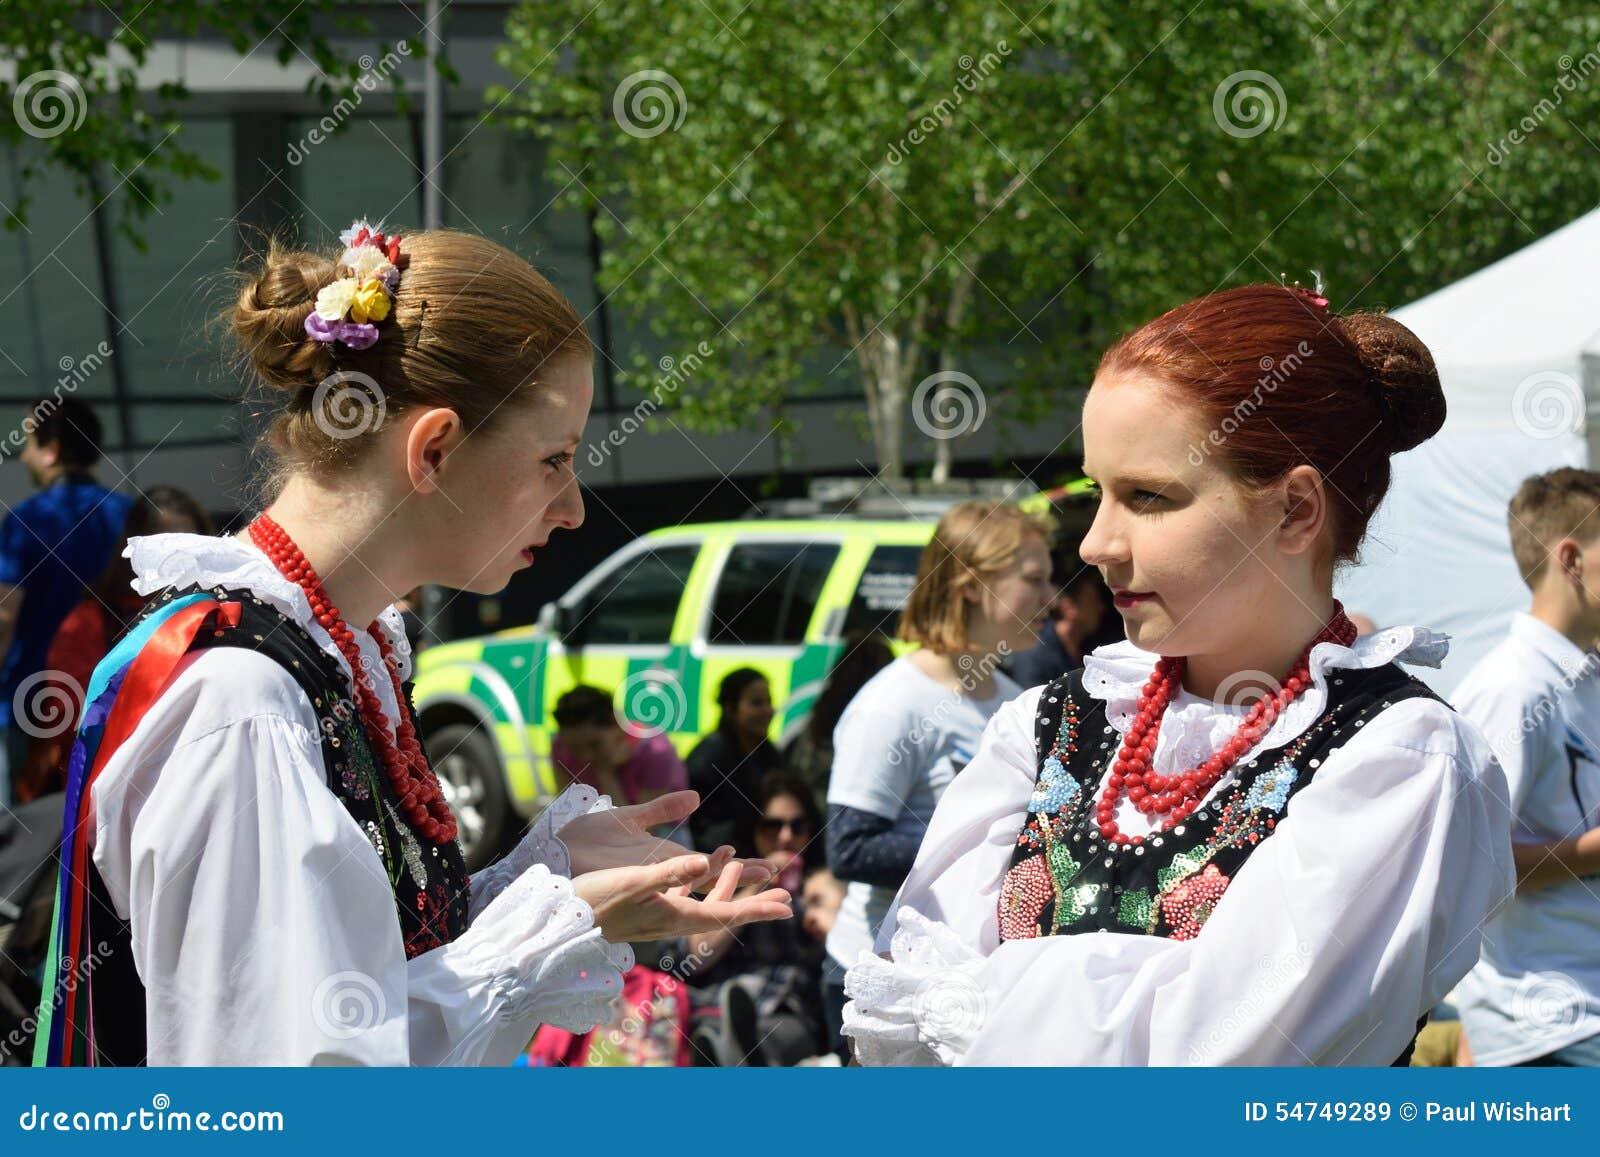 Polish girls in england